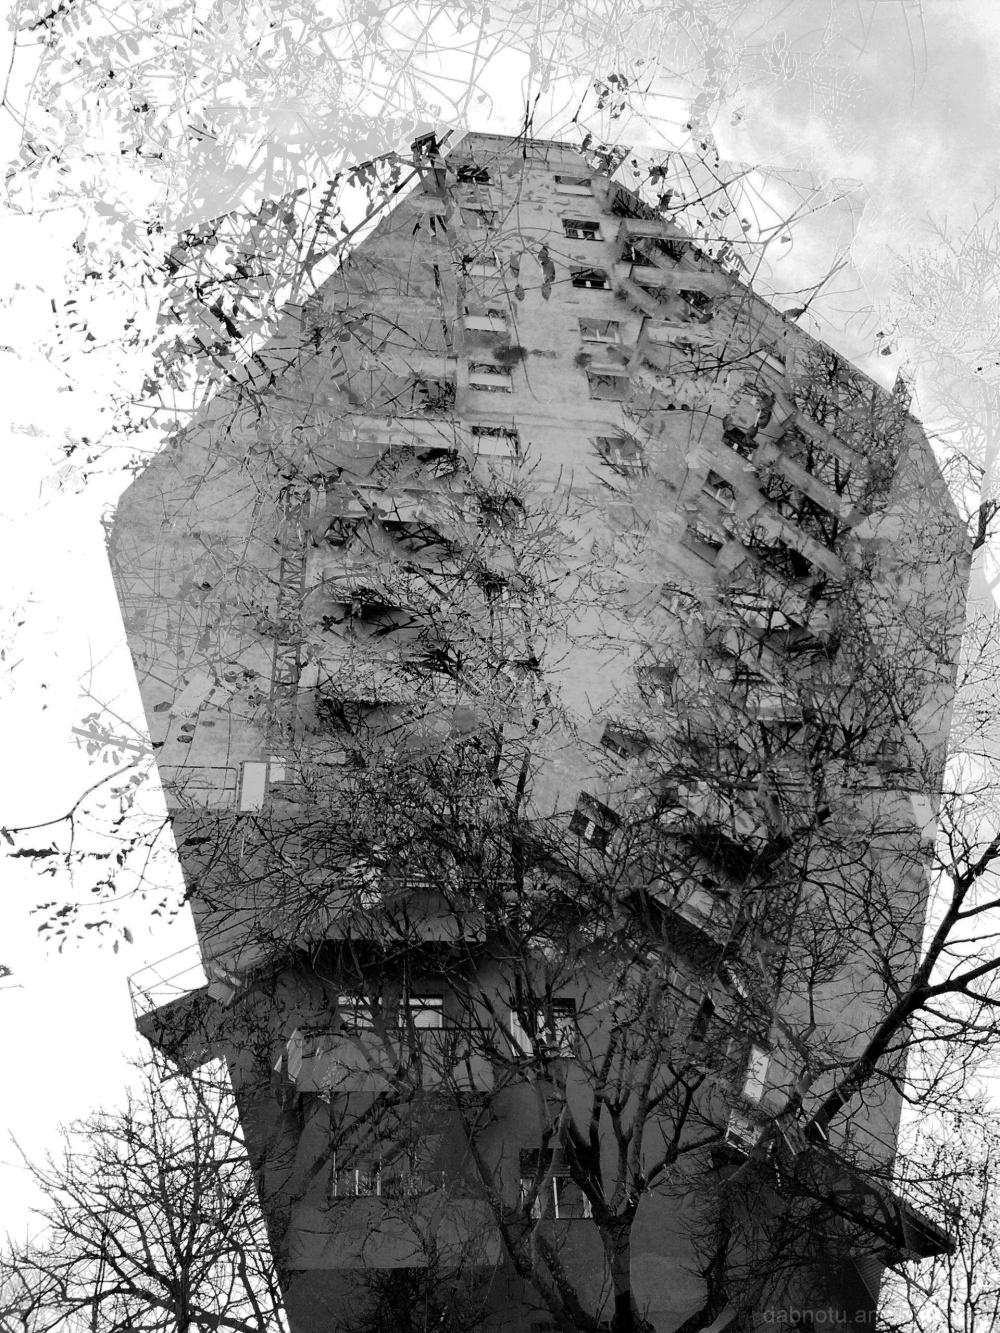 Barcelona grayscale street smartphone image, GIMP!